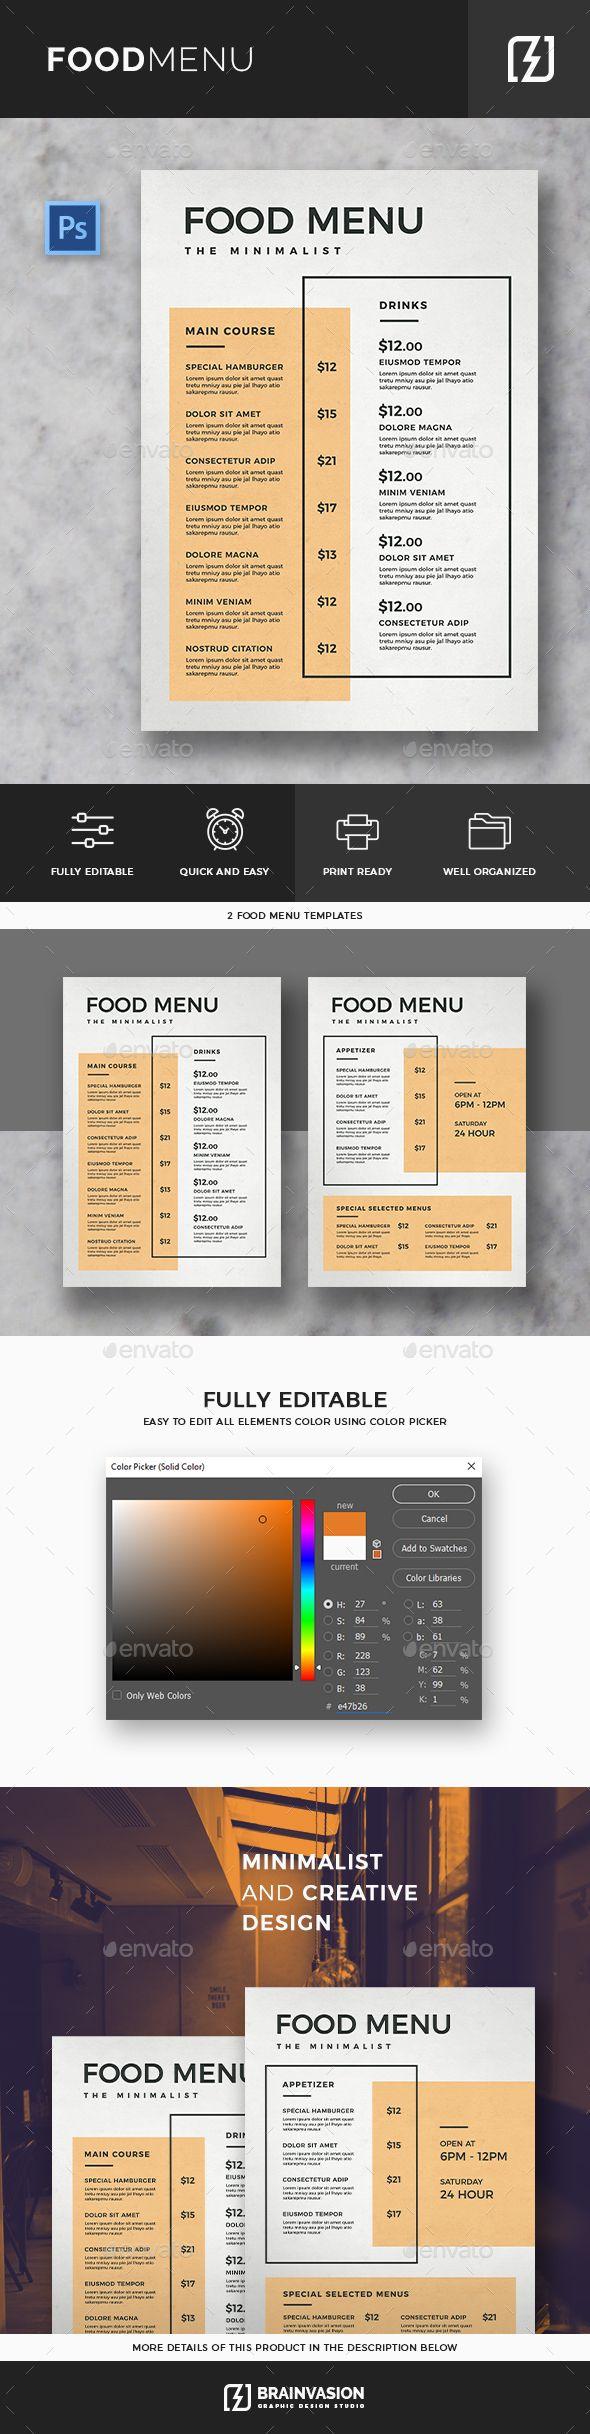 Minimal #Food #Menu Template - Food Menus Print Templates Download here:  https://graphicriver.net/item/minimal-food-menu-template/20014433?ref=alena994